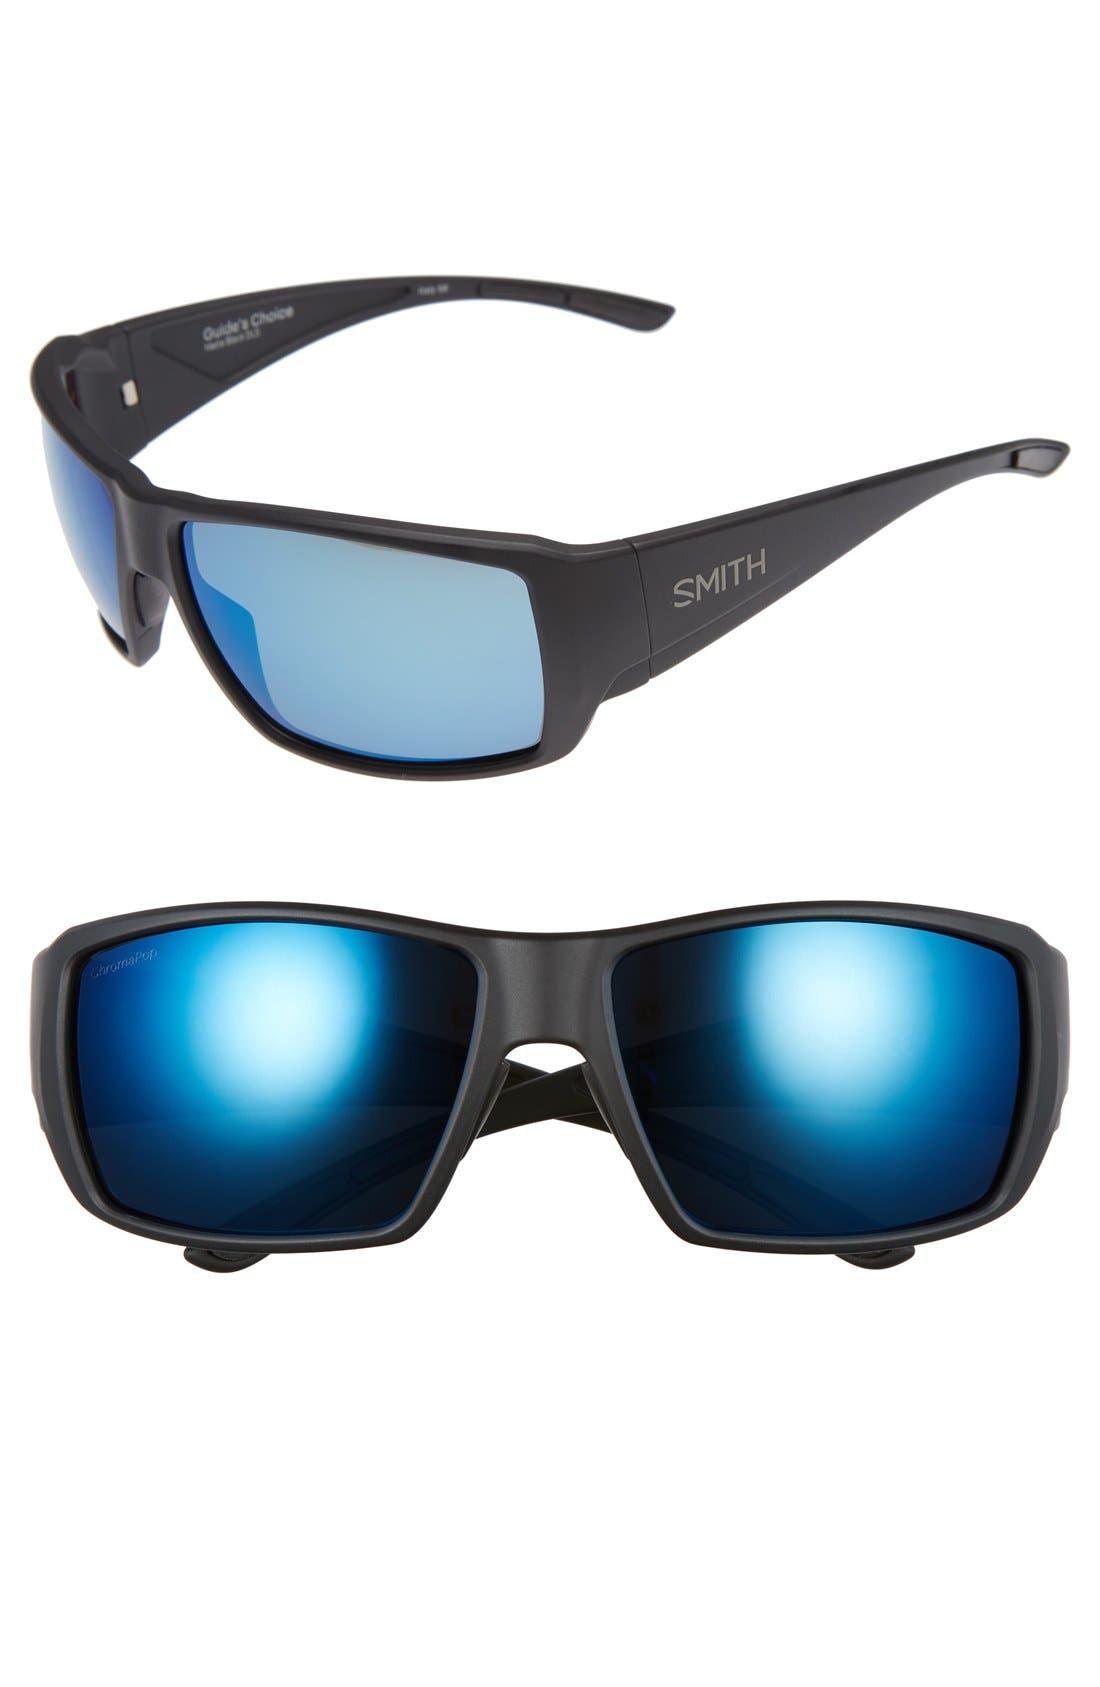 Smith 'Guide's Choice' 62mm Polarized Sunglasses